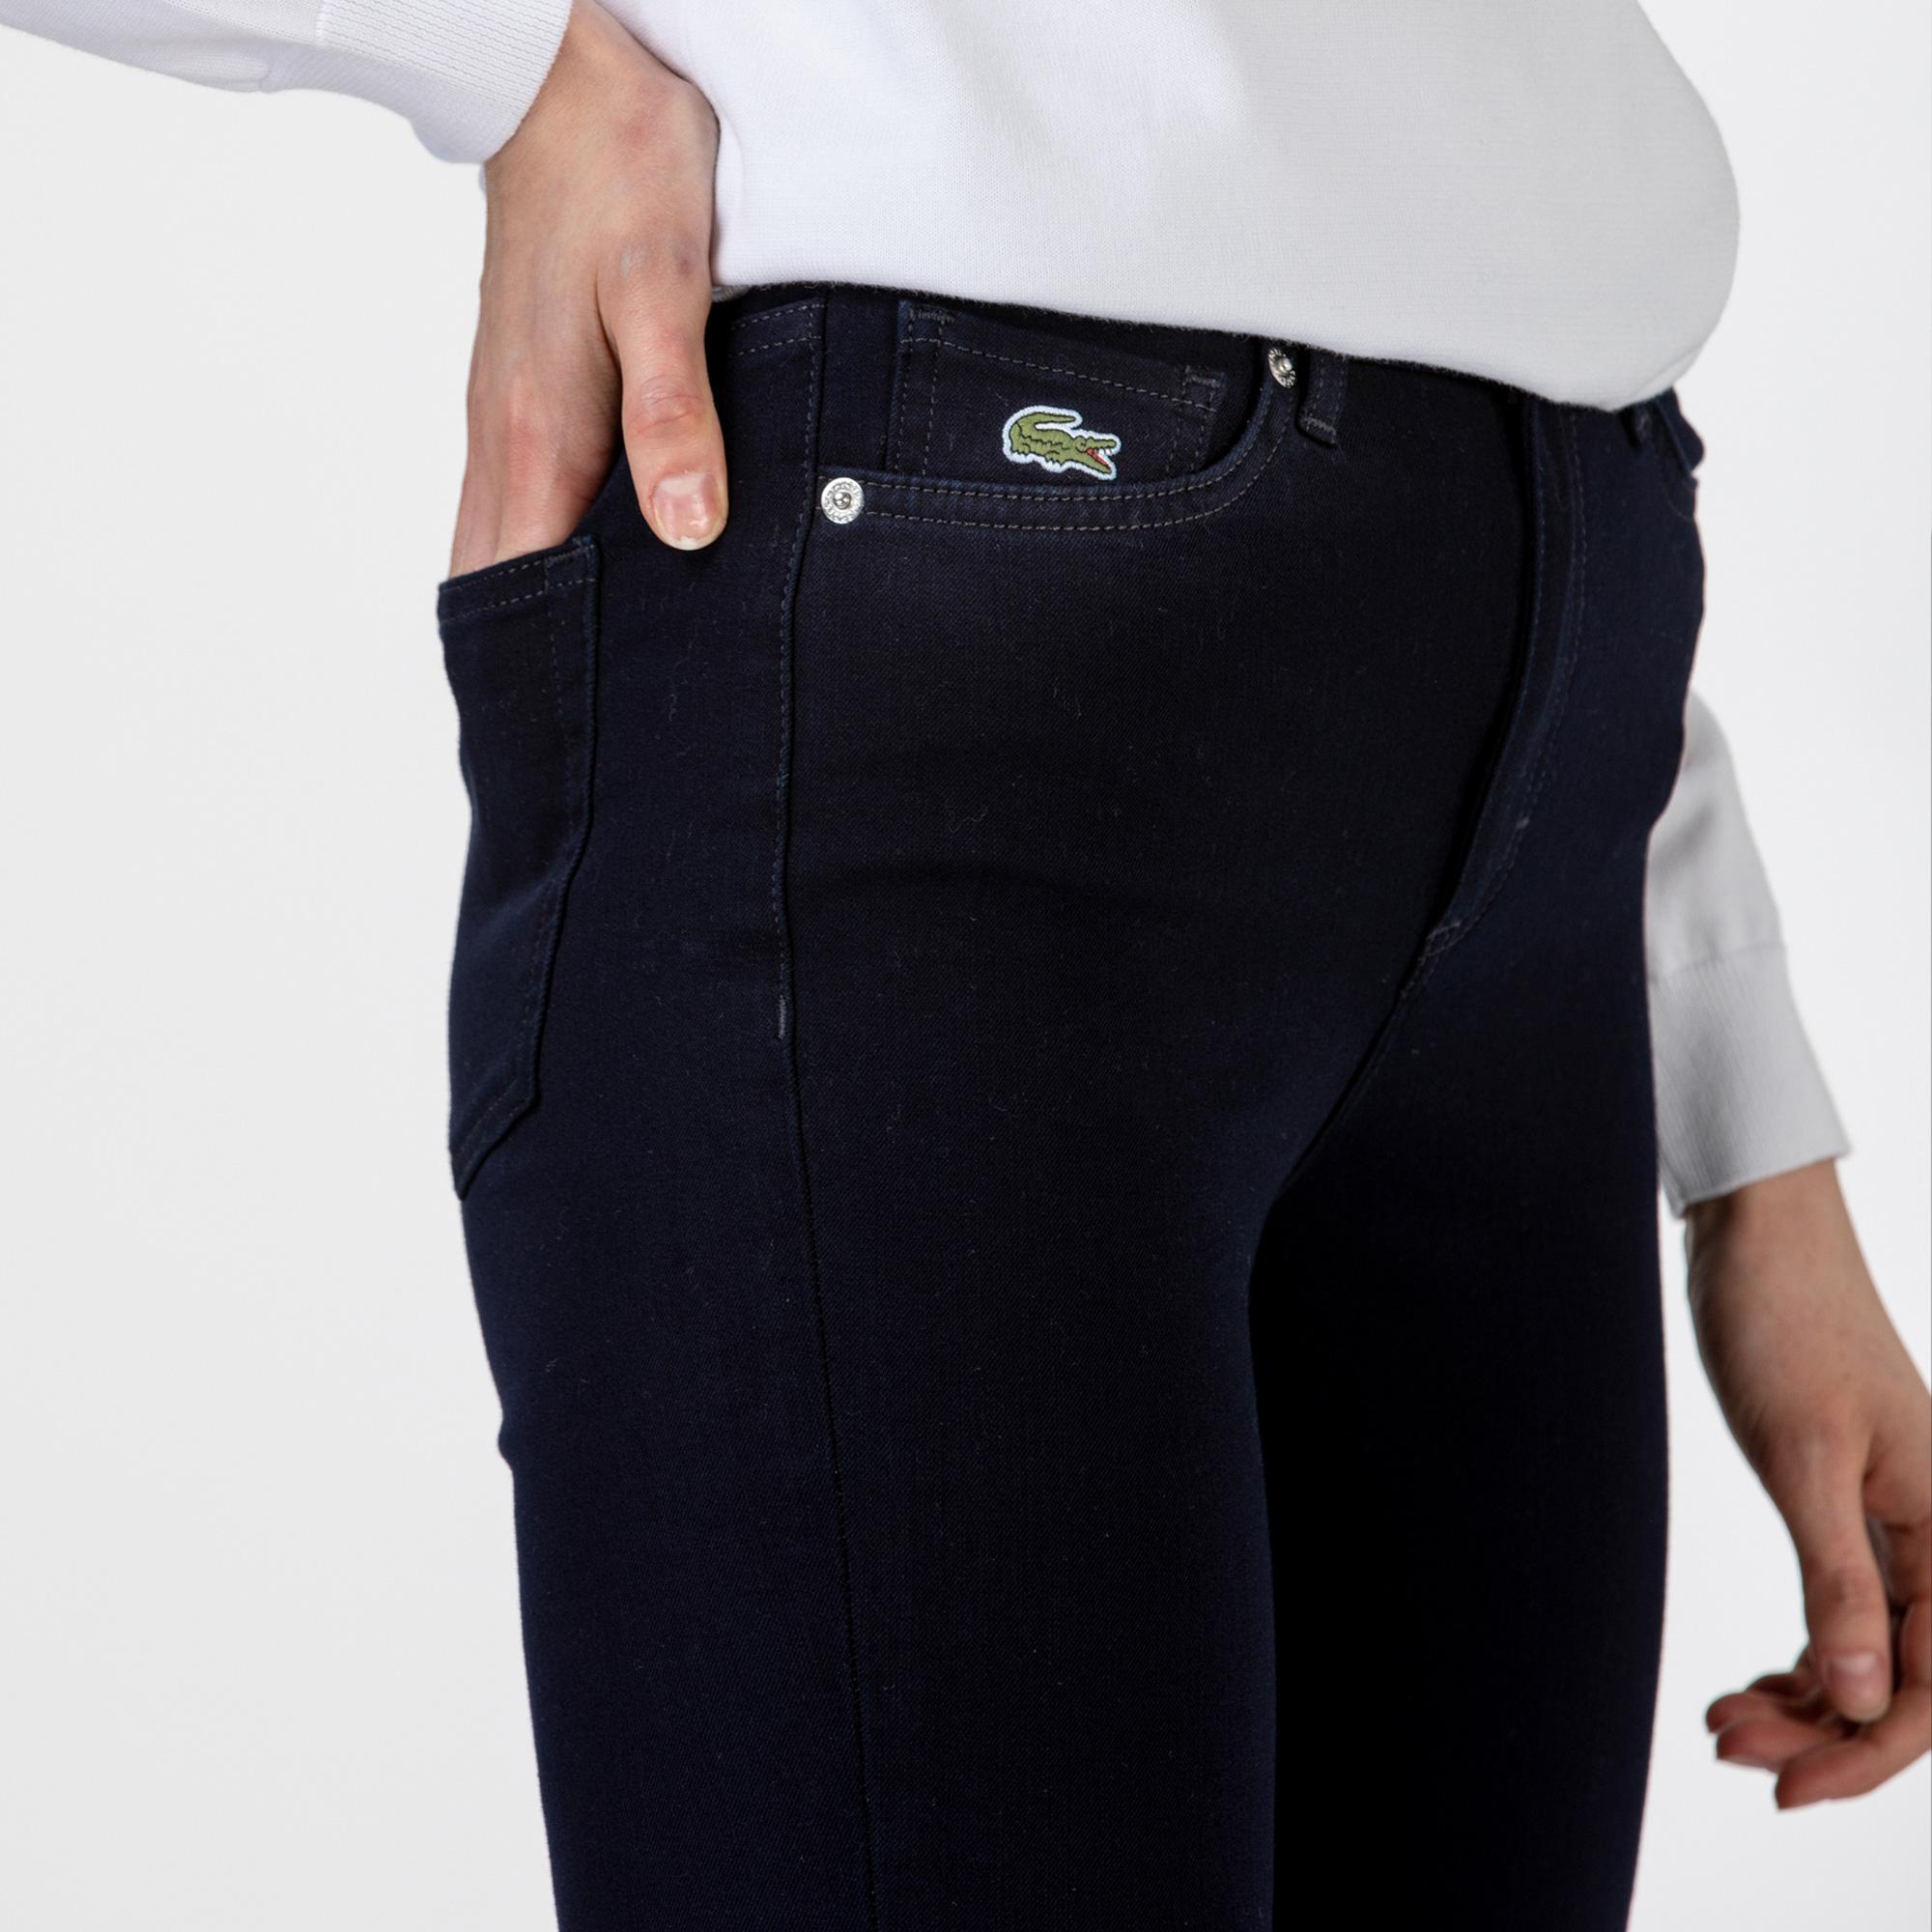 Lacoste Kadın Skinny Fit Lacivert Denim Pantolon